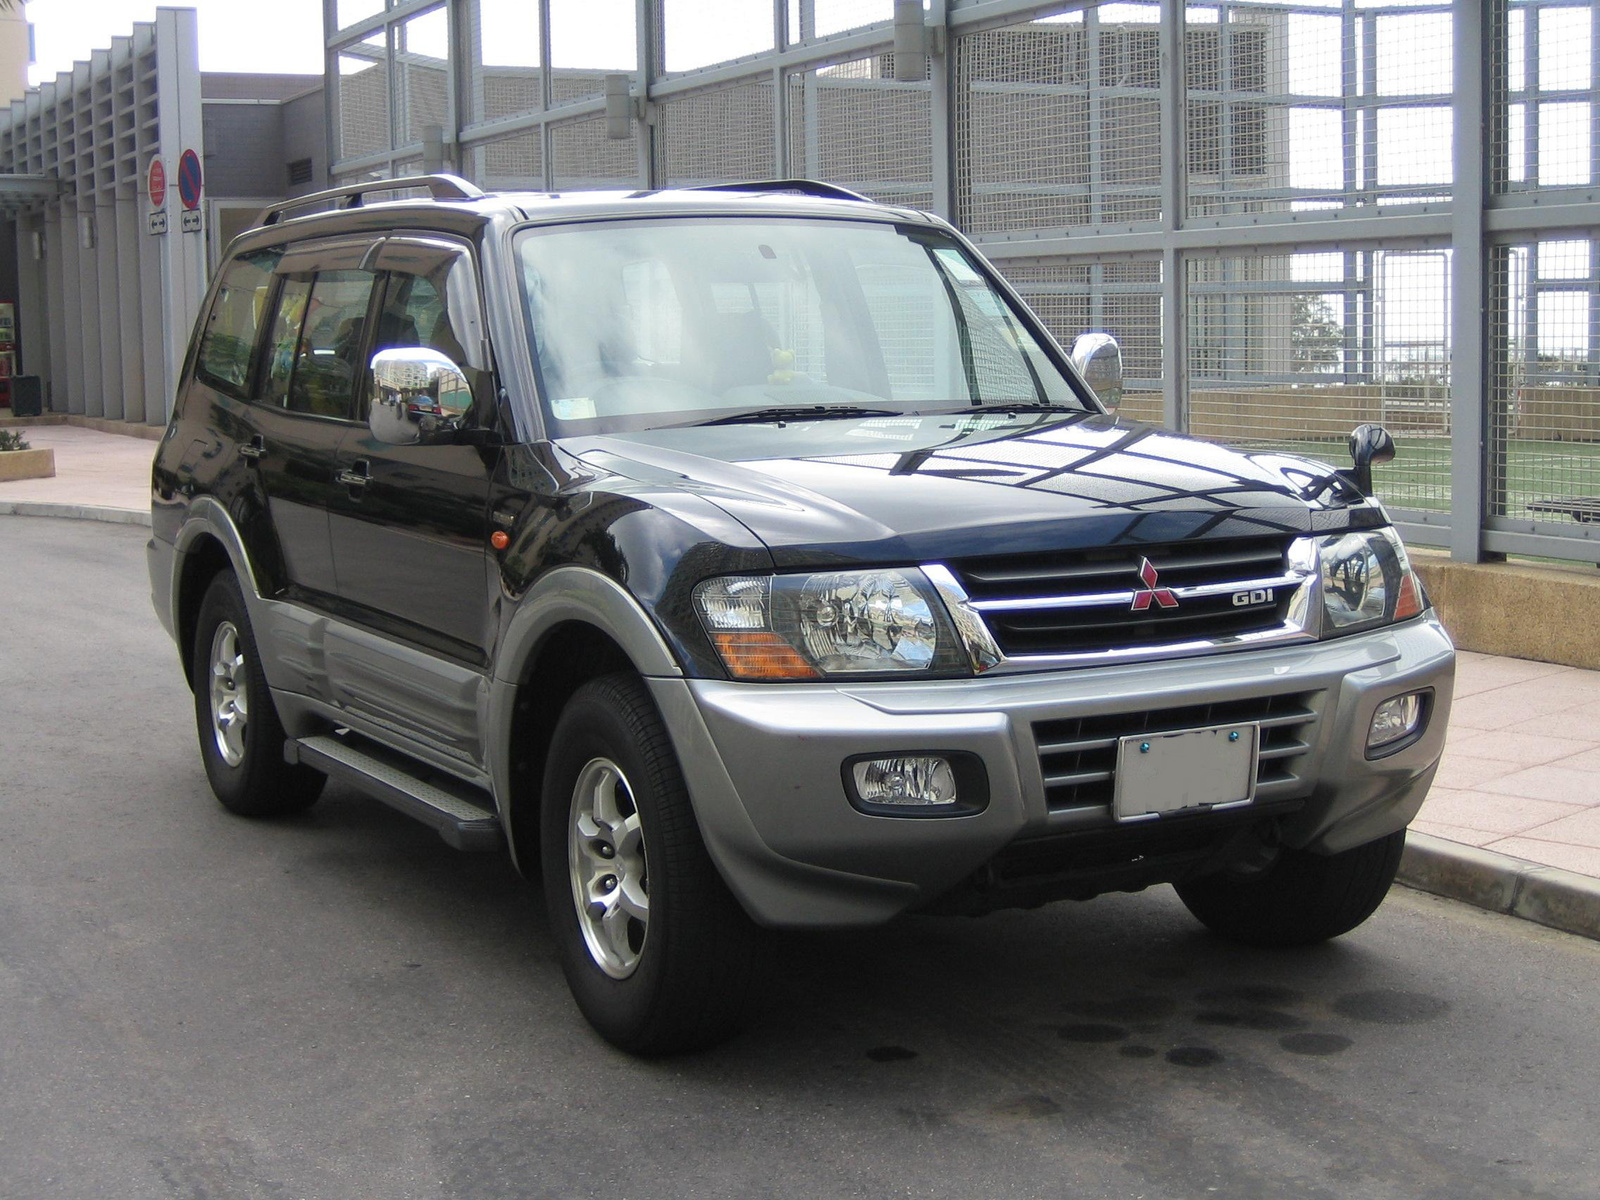 2000 Mitsubishi Pajero Pictures Cargurus